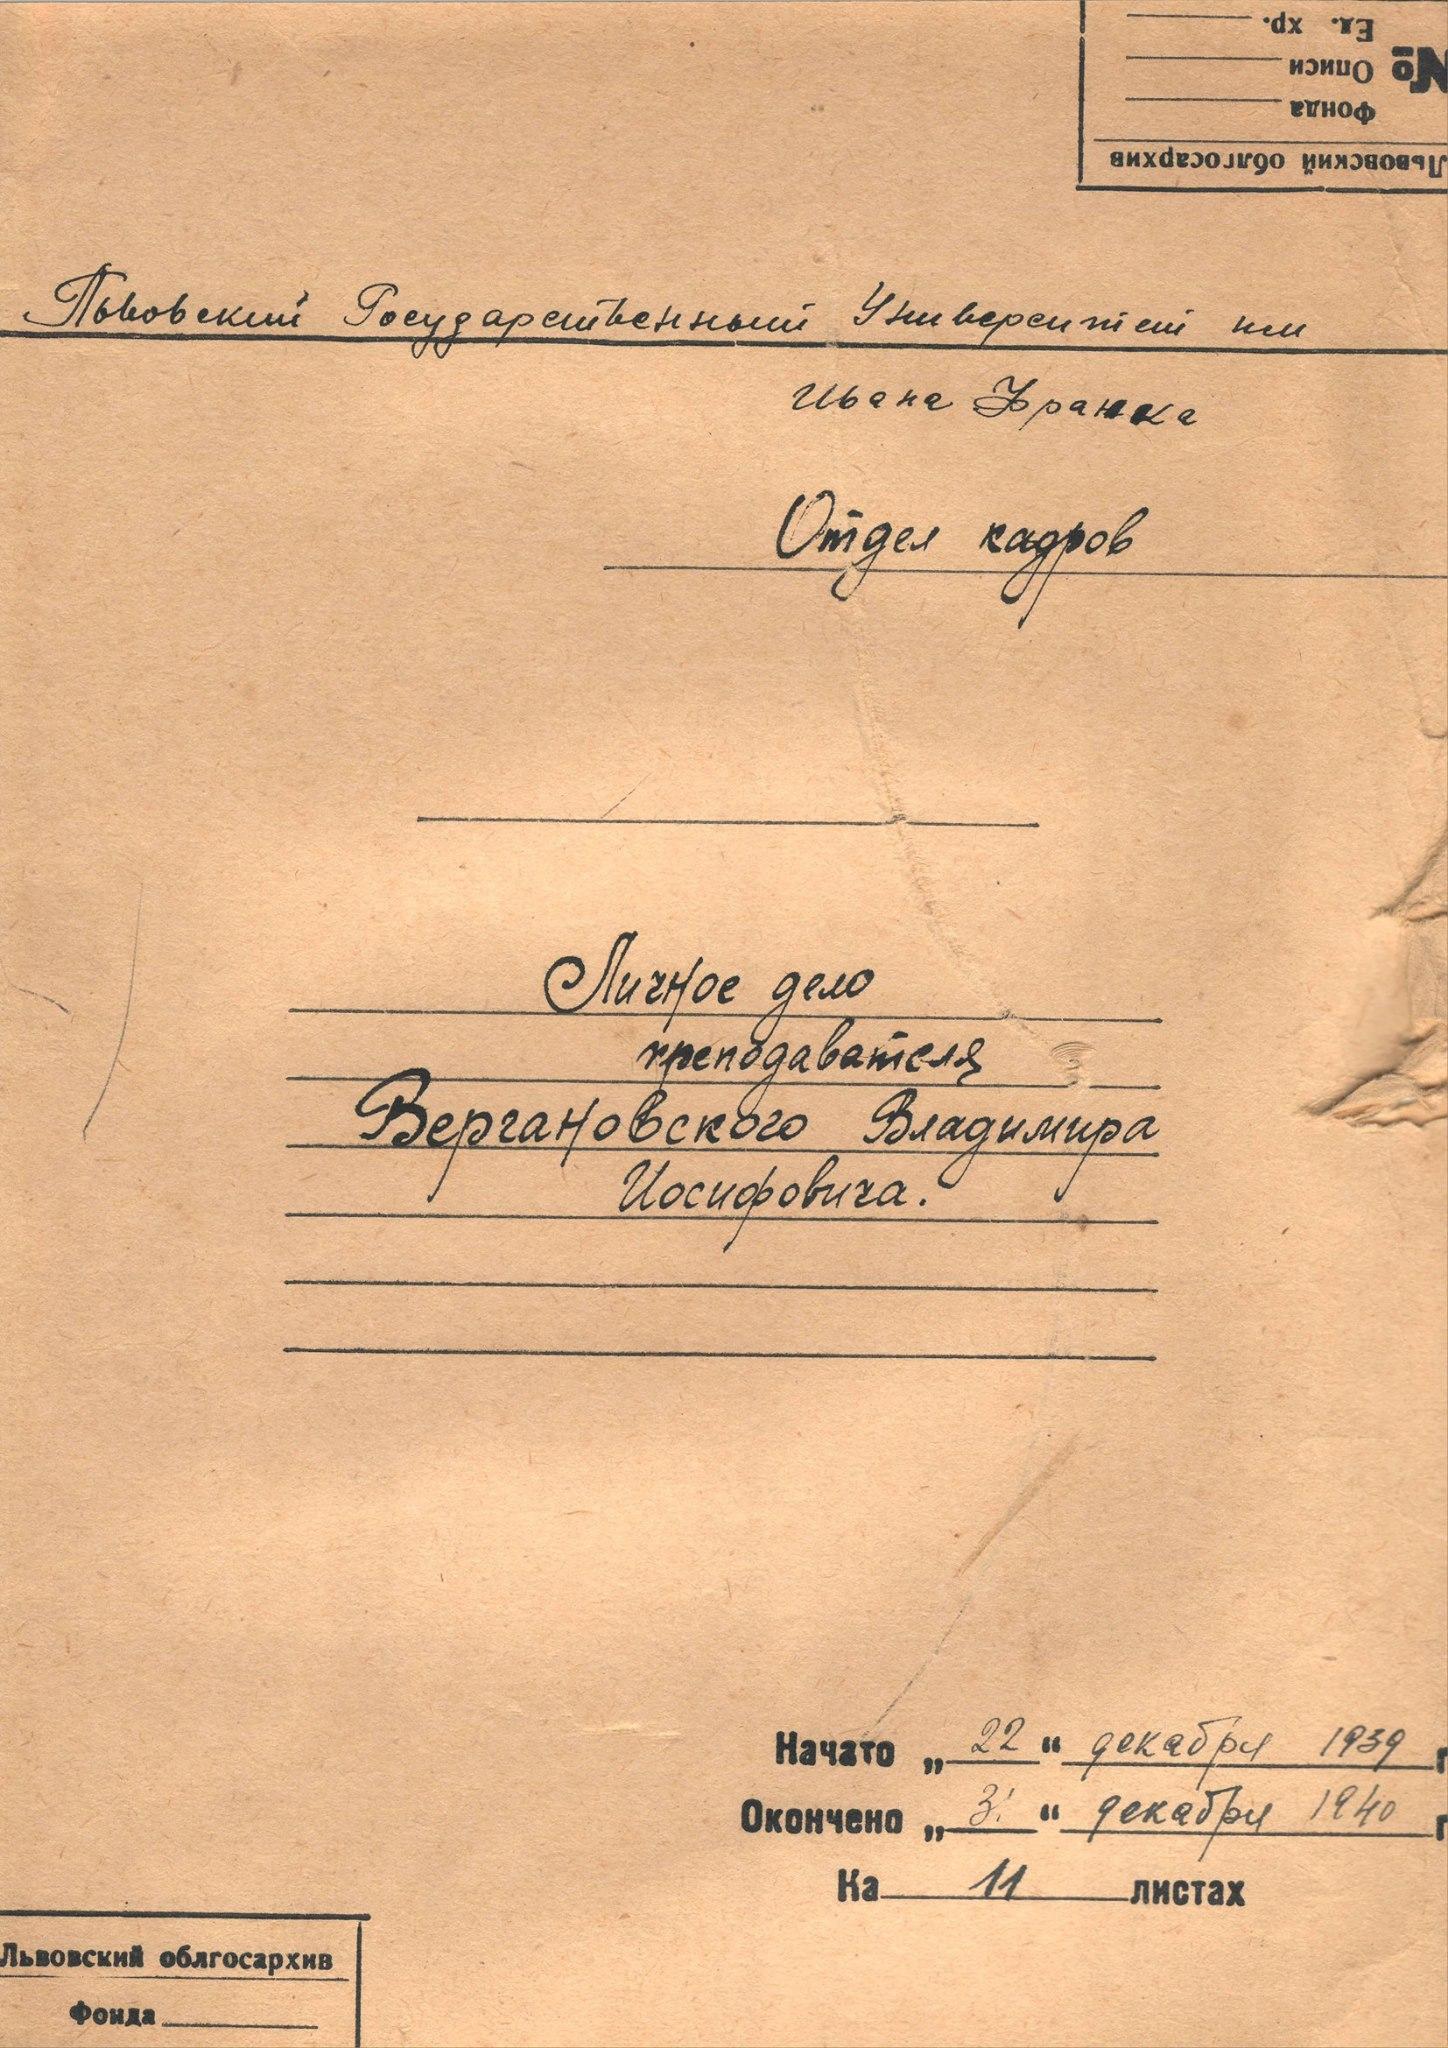 обкладинка альбому 1949